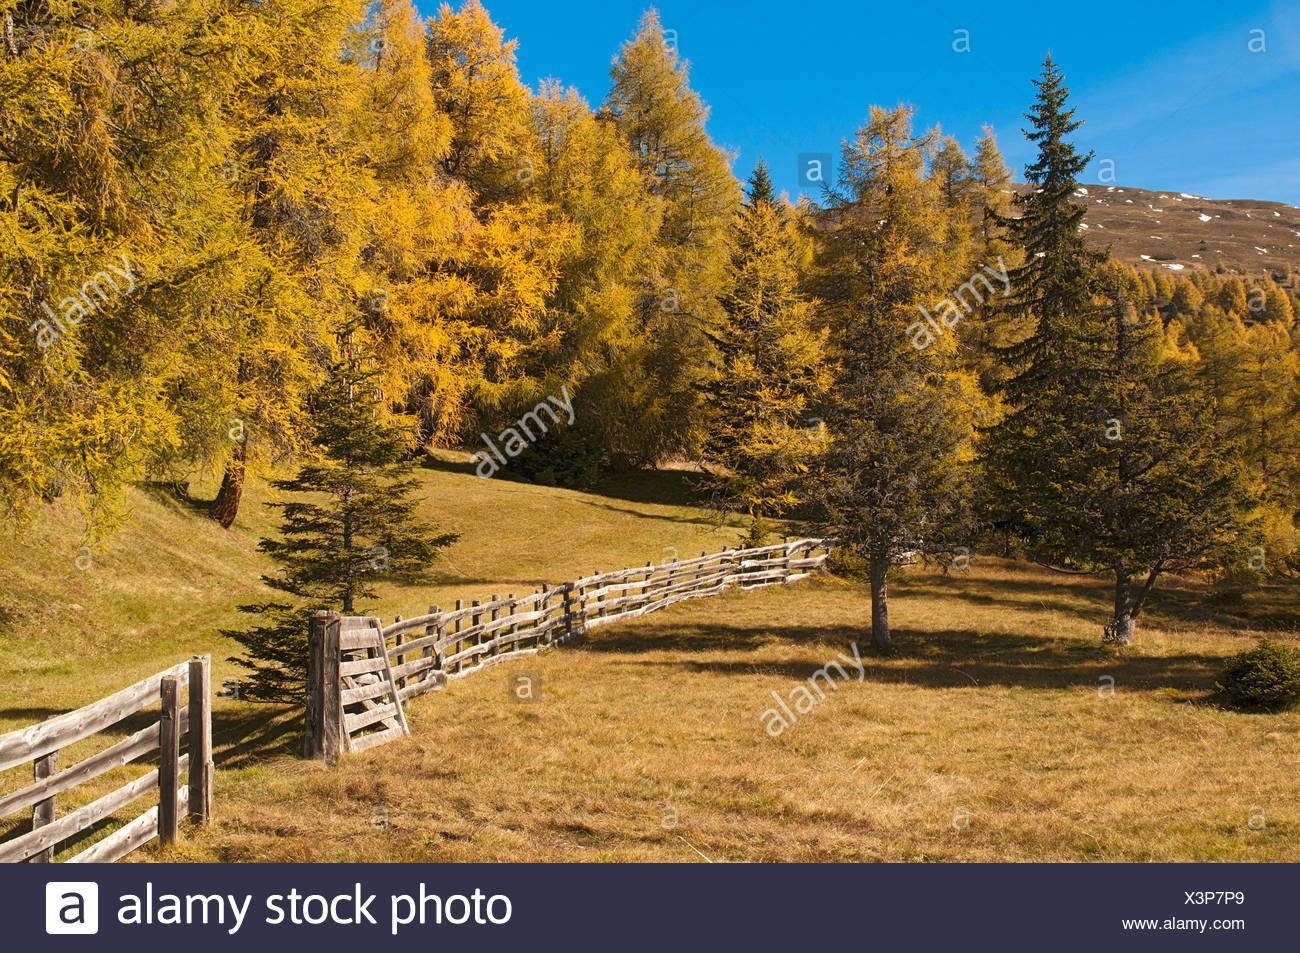 Cultural landscape with larches, Laerchenwiesen larch meadows, Obernbergtal, Tyrol, Austria, Europe Stock Photo